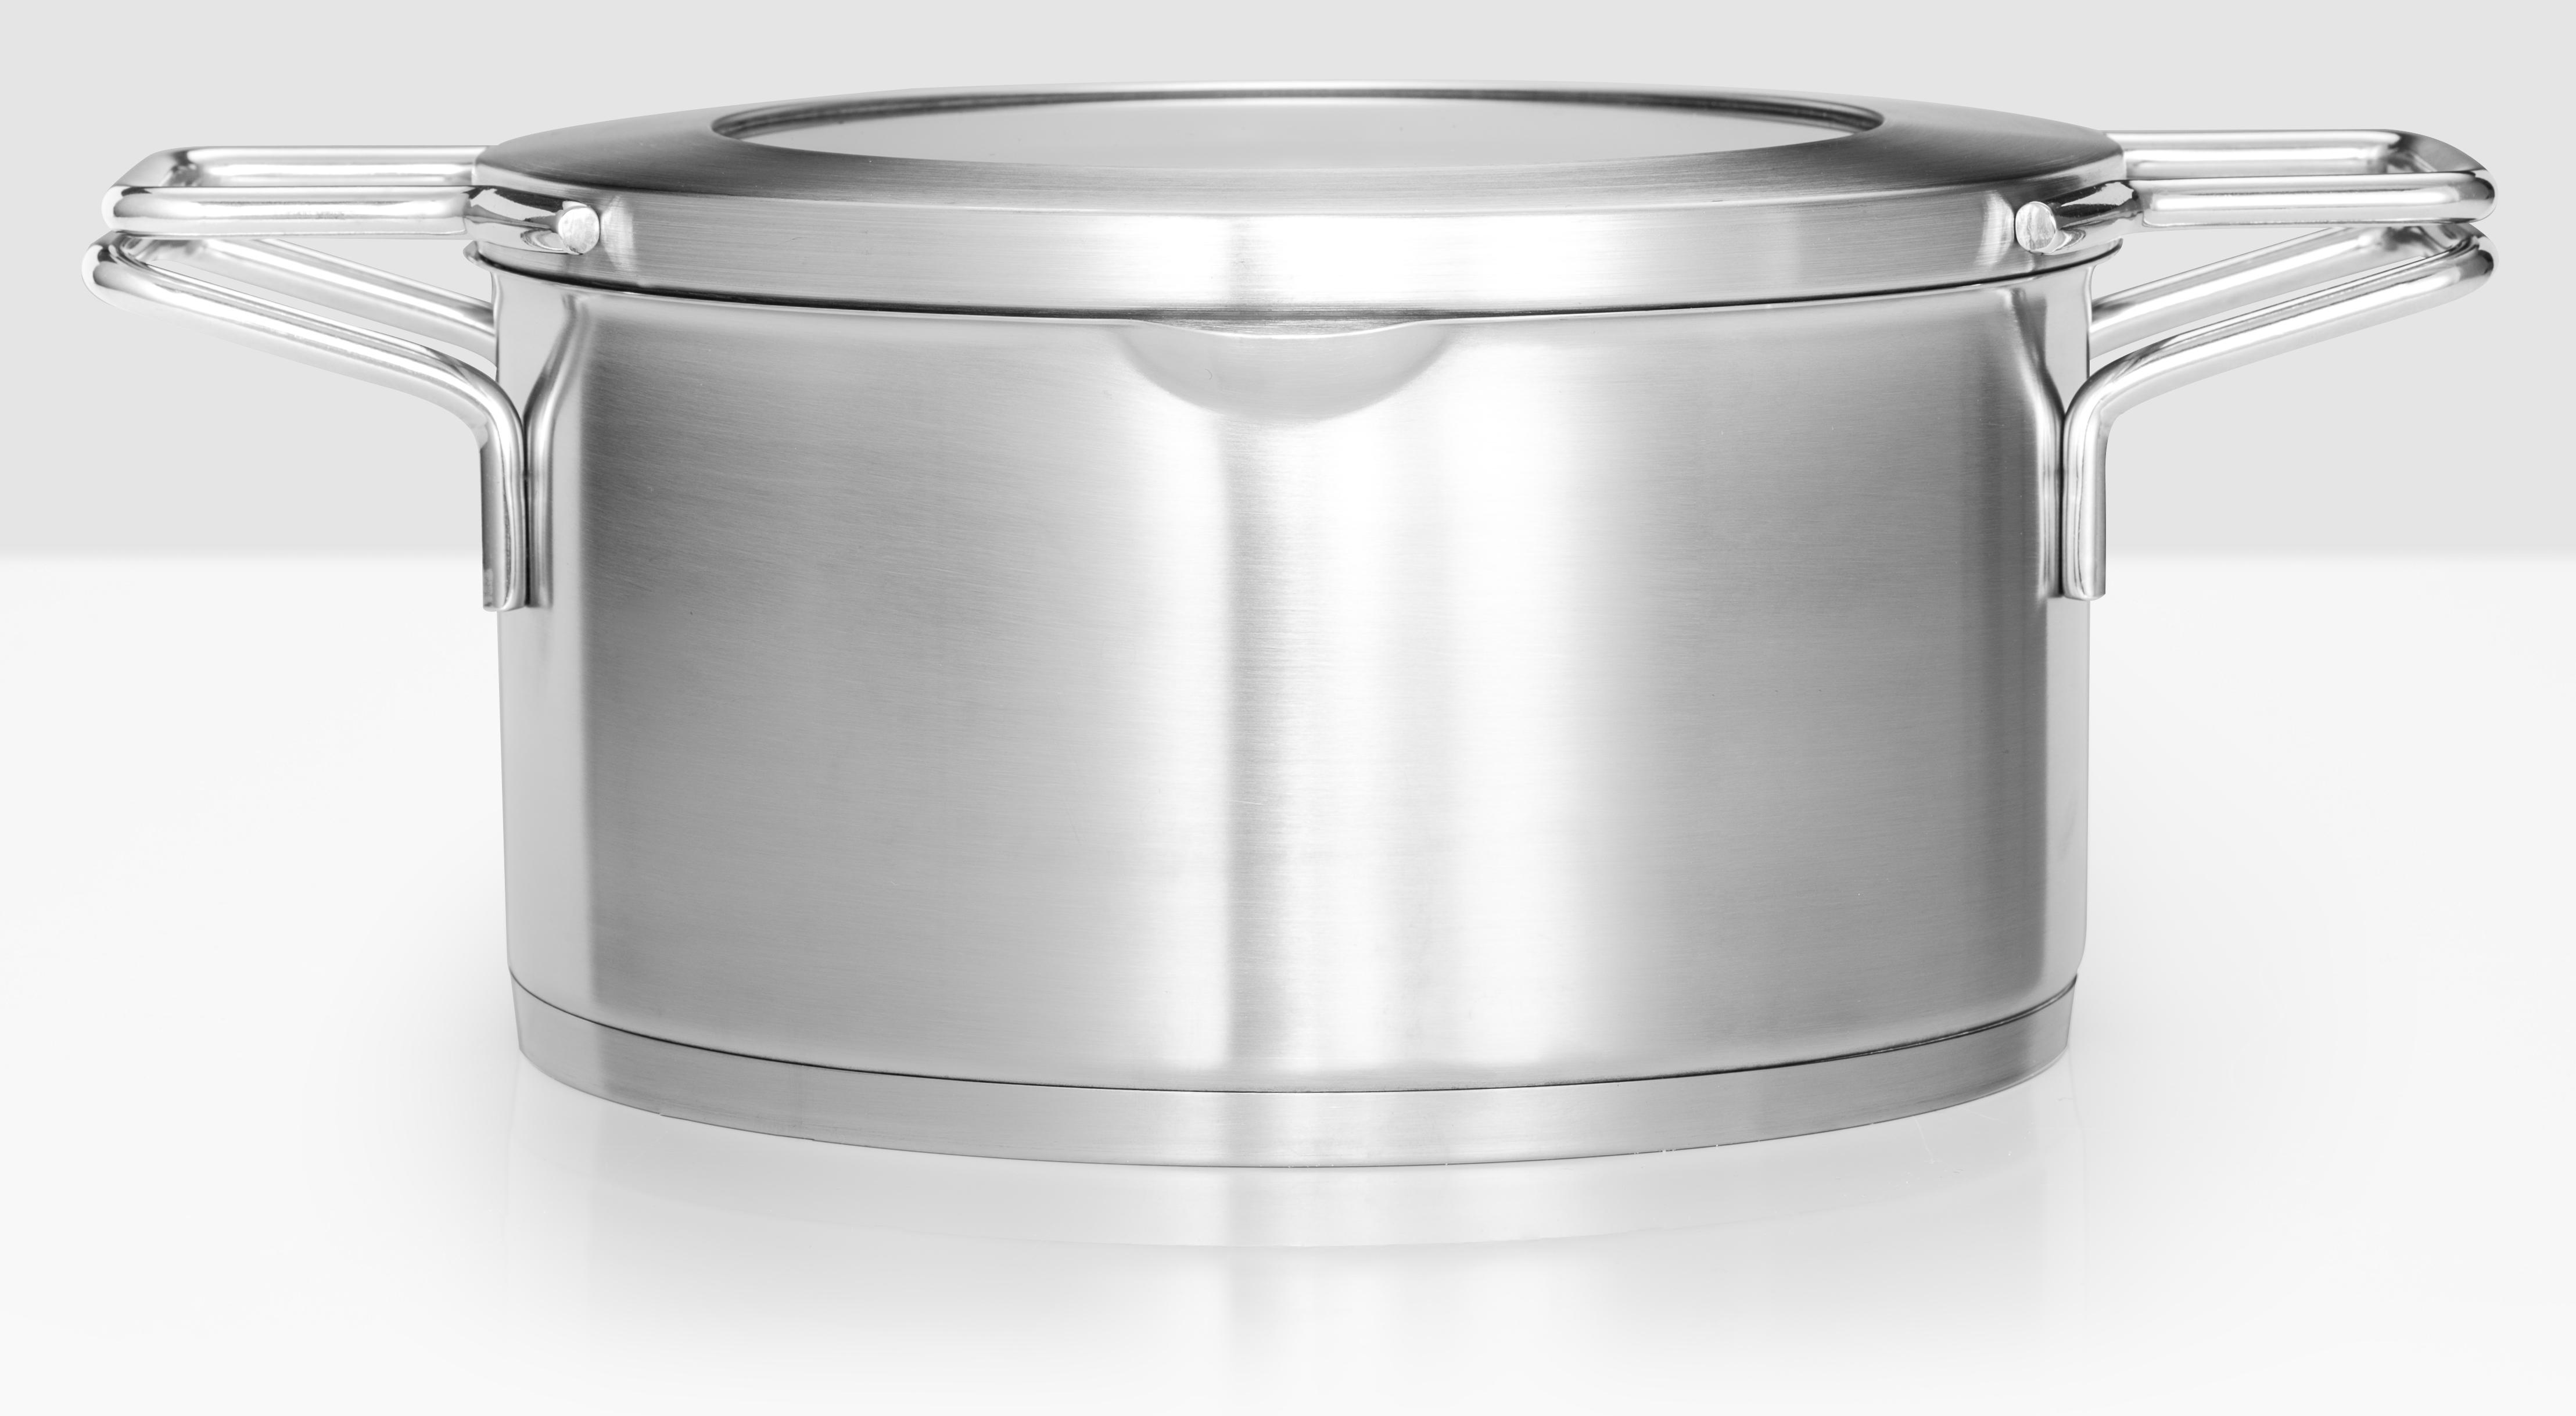 OBH Nordica Supreme Steel Gryte 5 liter